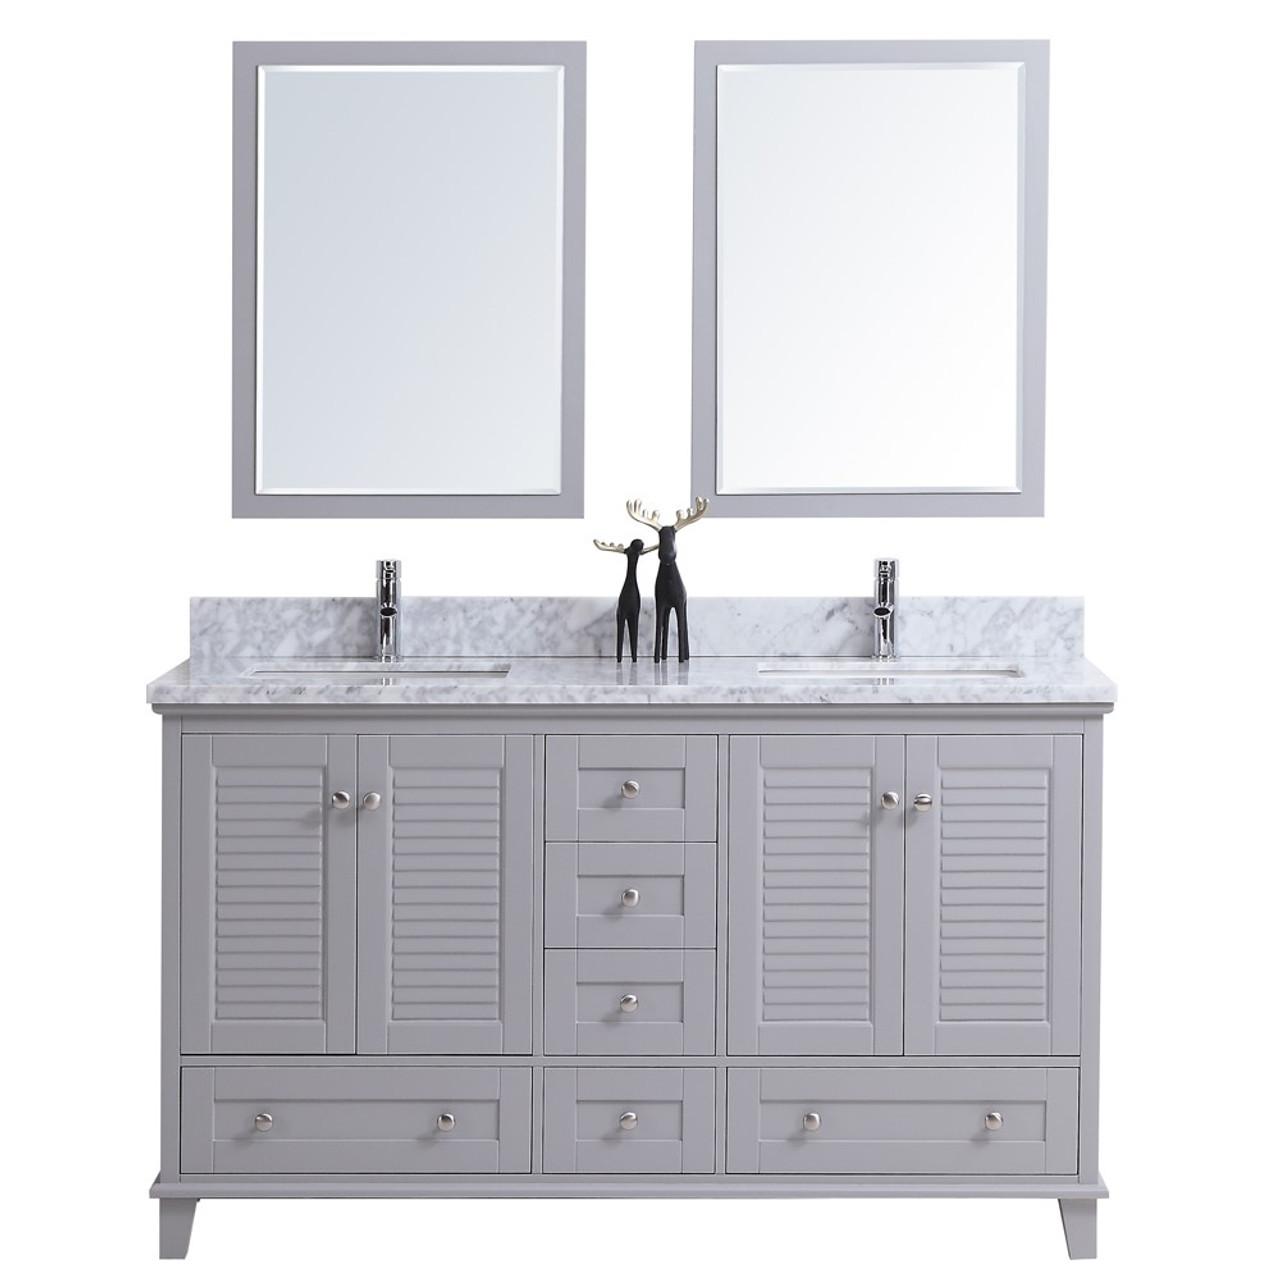 Niagara 60 Bathroom Vanity Double Sinks York Taps